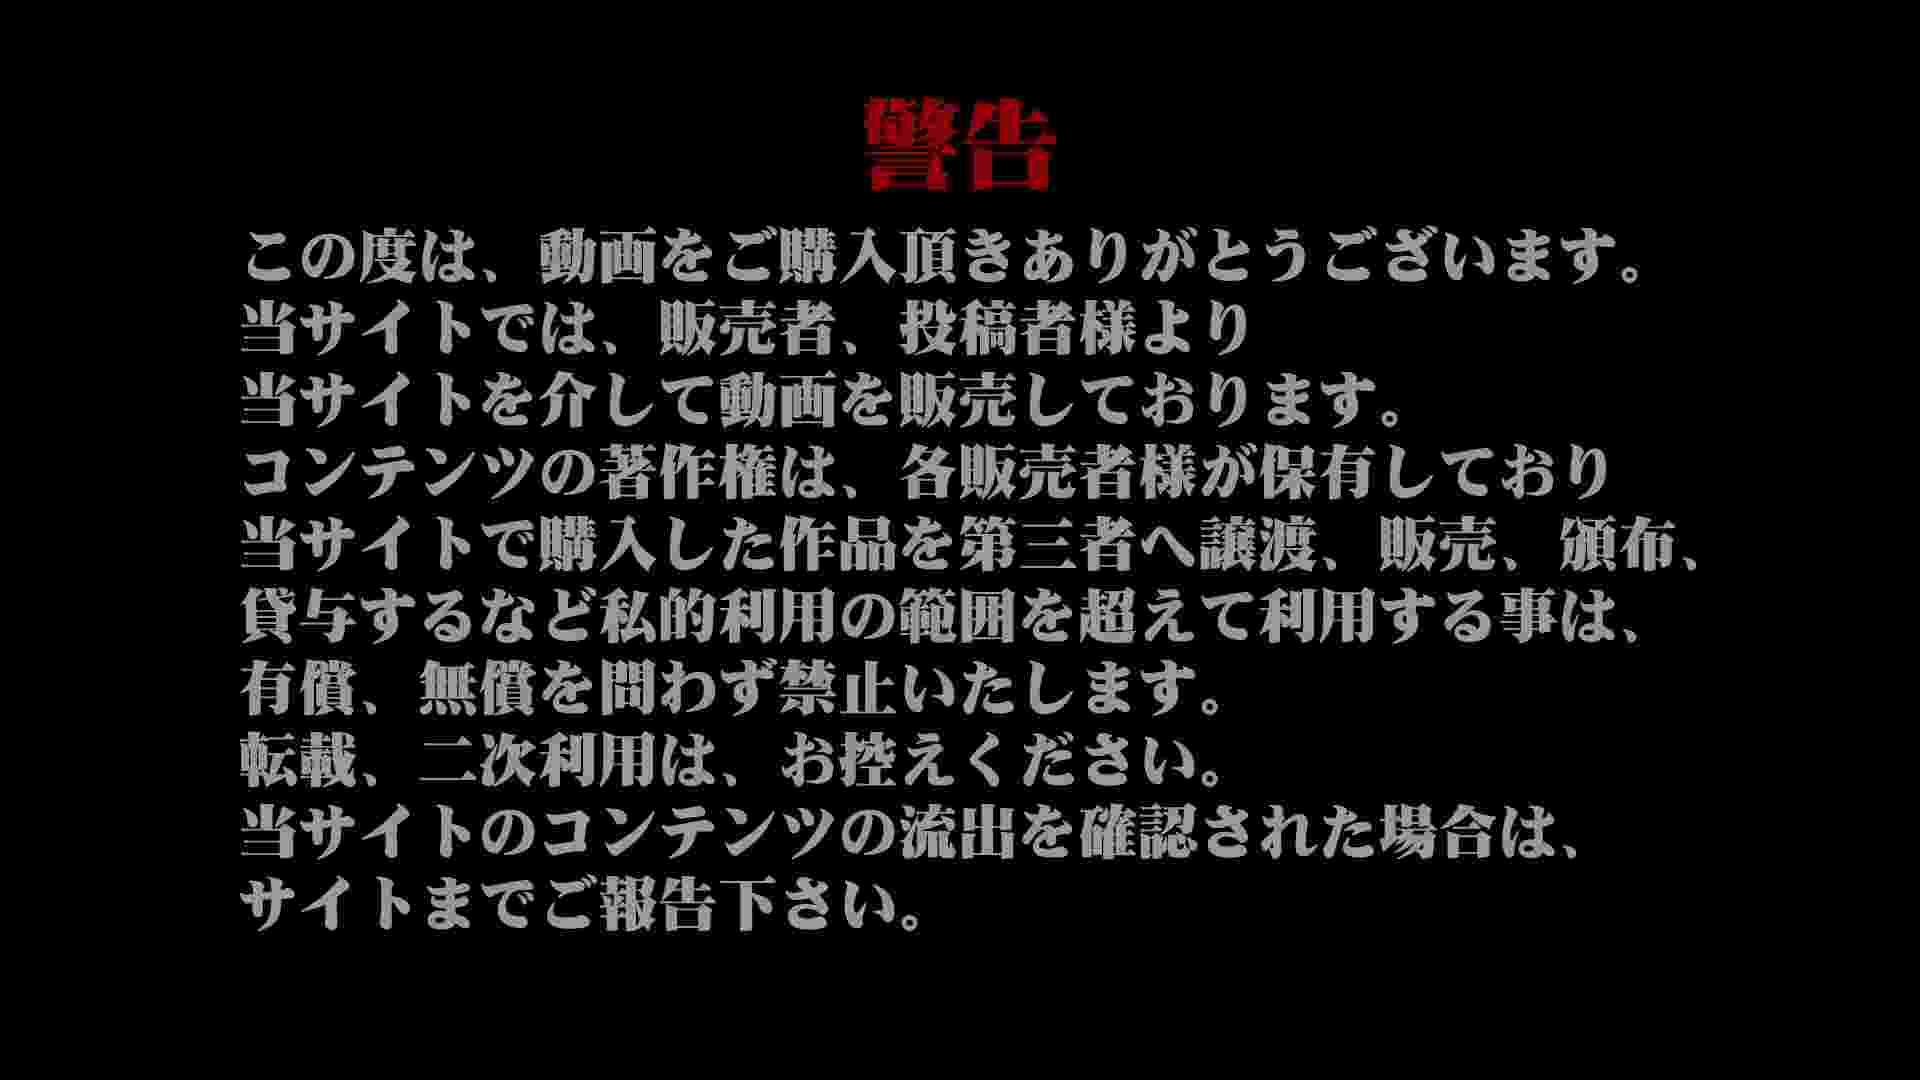 Aquaな露天風呂Vol.953 0 | 0  73連発 1